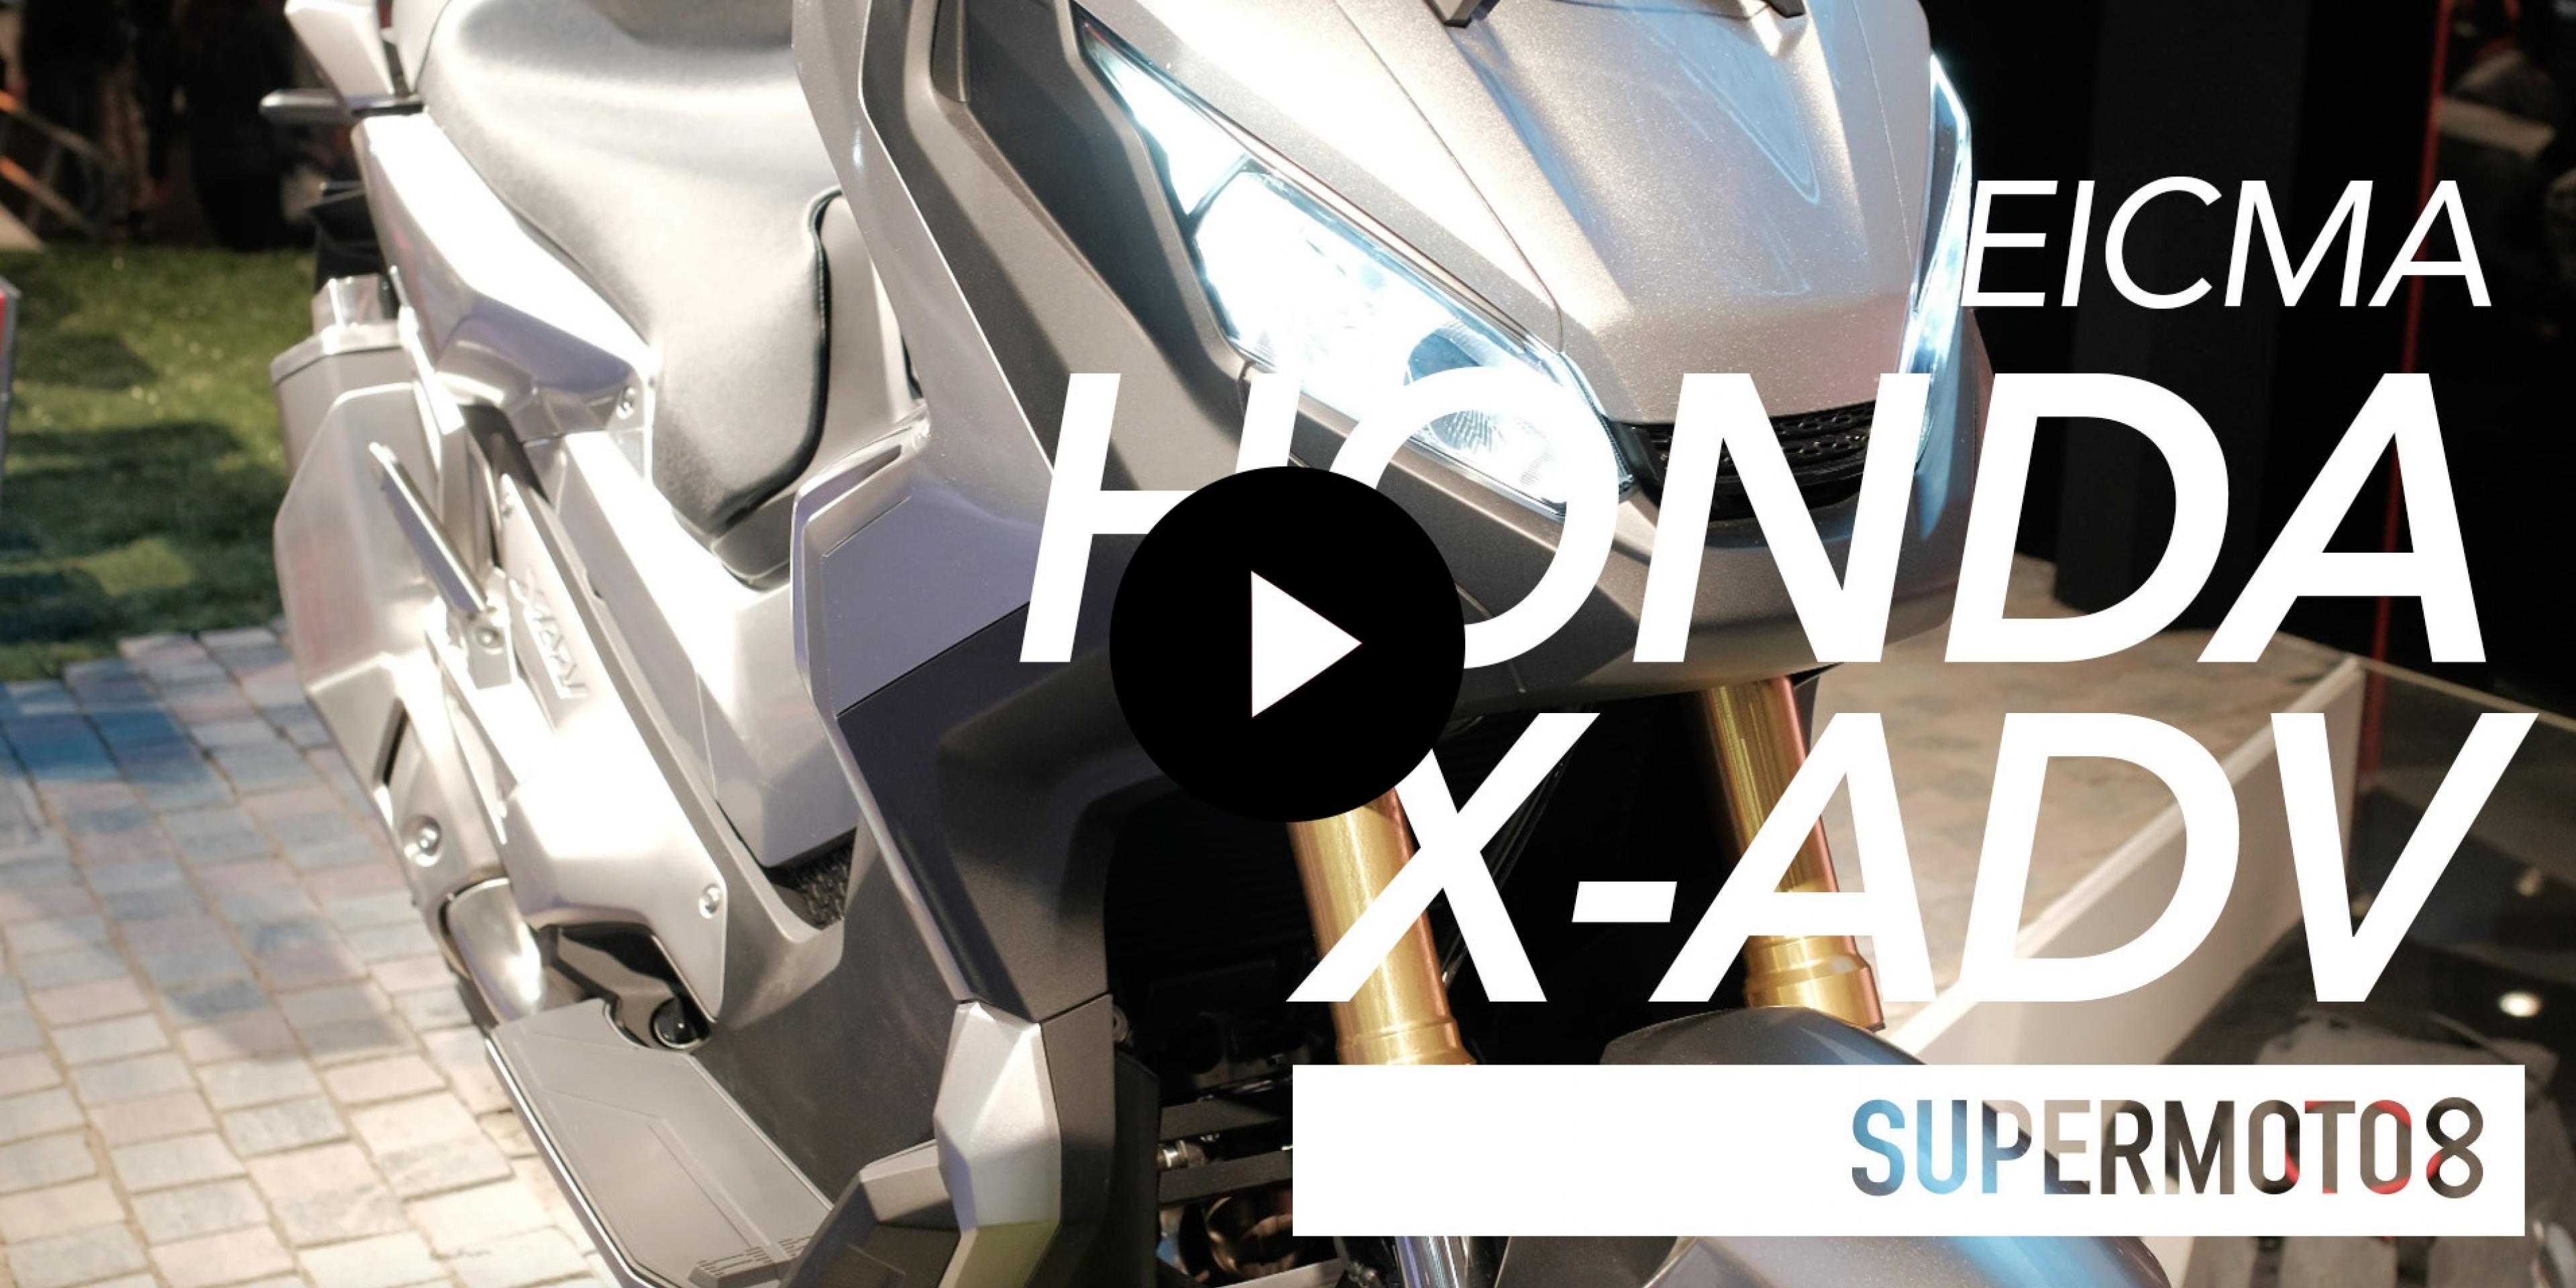 2017 HONDA X-ADV EICMA米蘭車展實拍